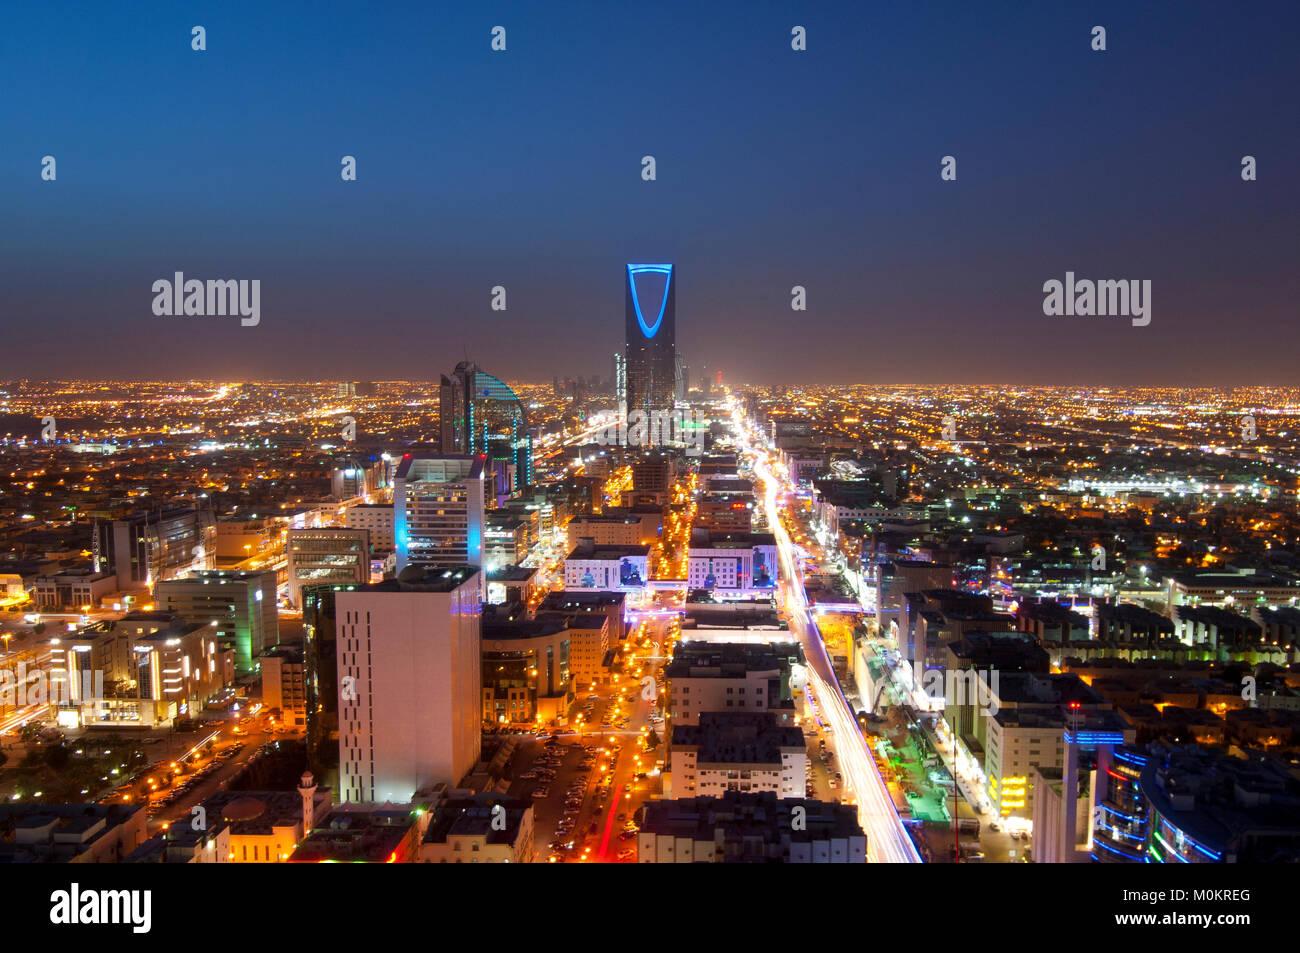 Riyadh skyline notturno n. 1 Immagini Stock